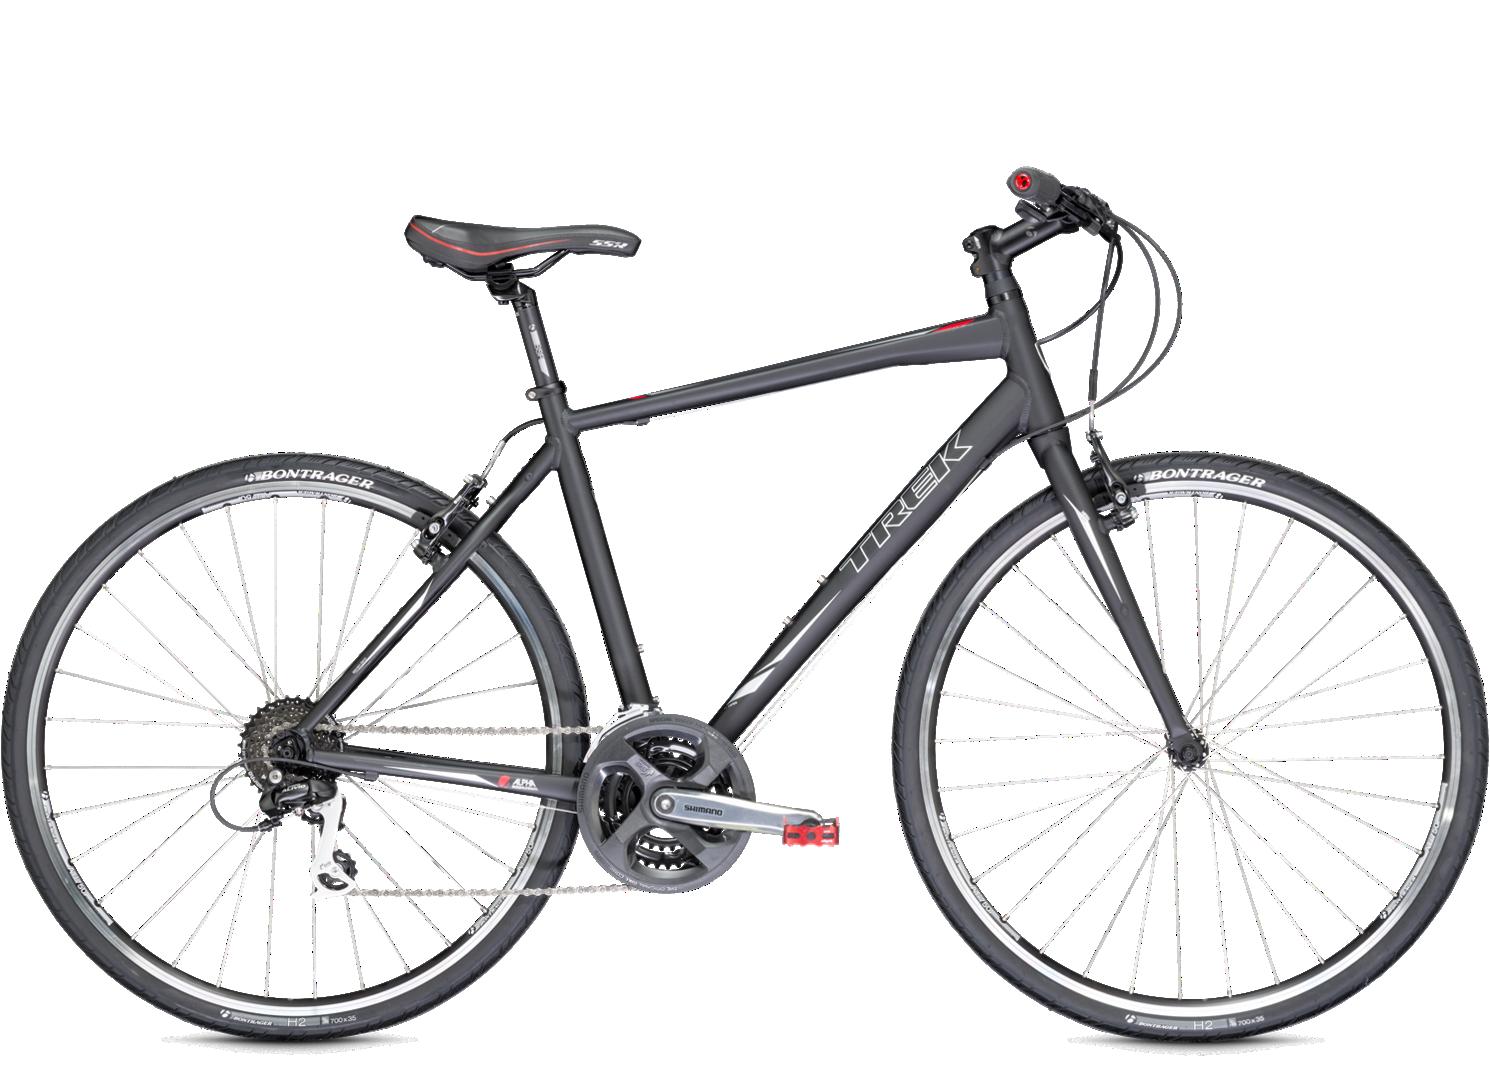 2014 7 2 Fx Bike Archive Trek Bicycle